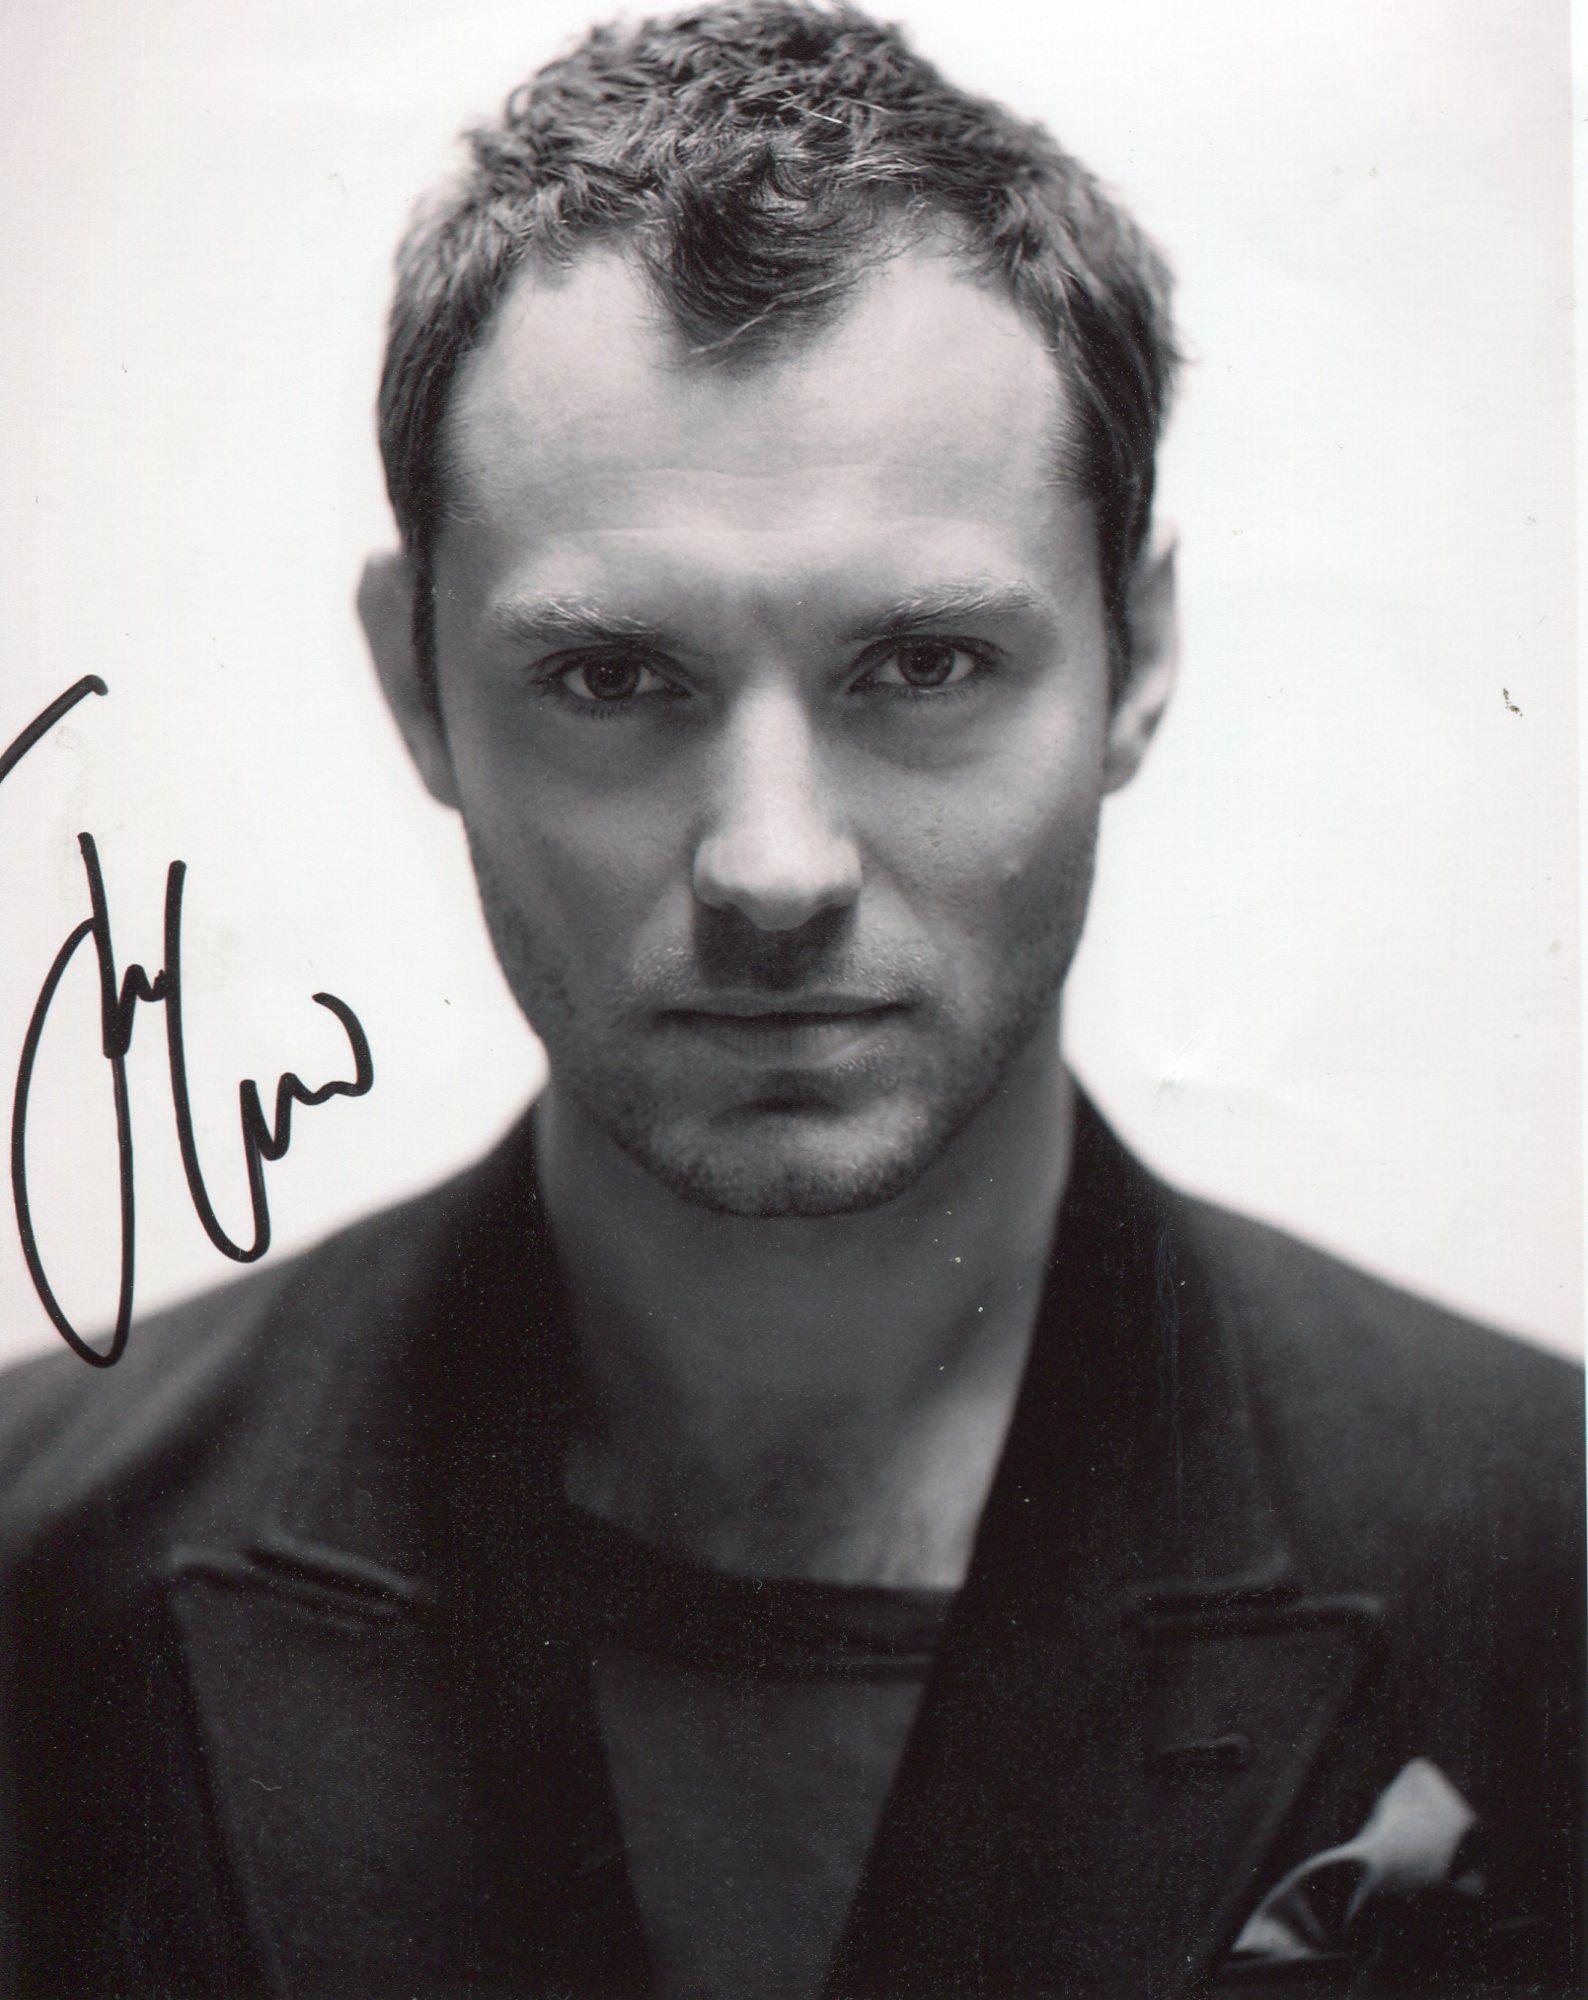 Jude Law (born 1972)